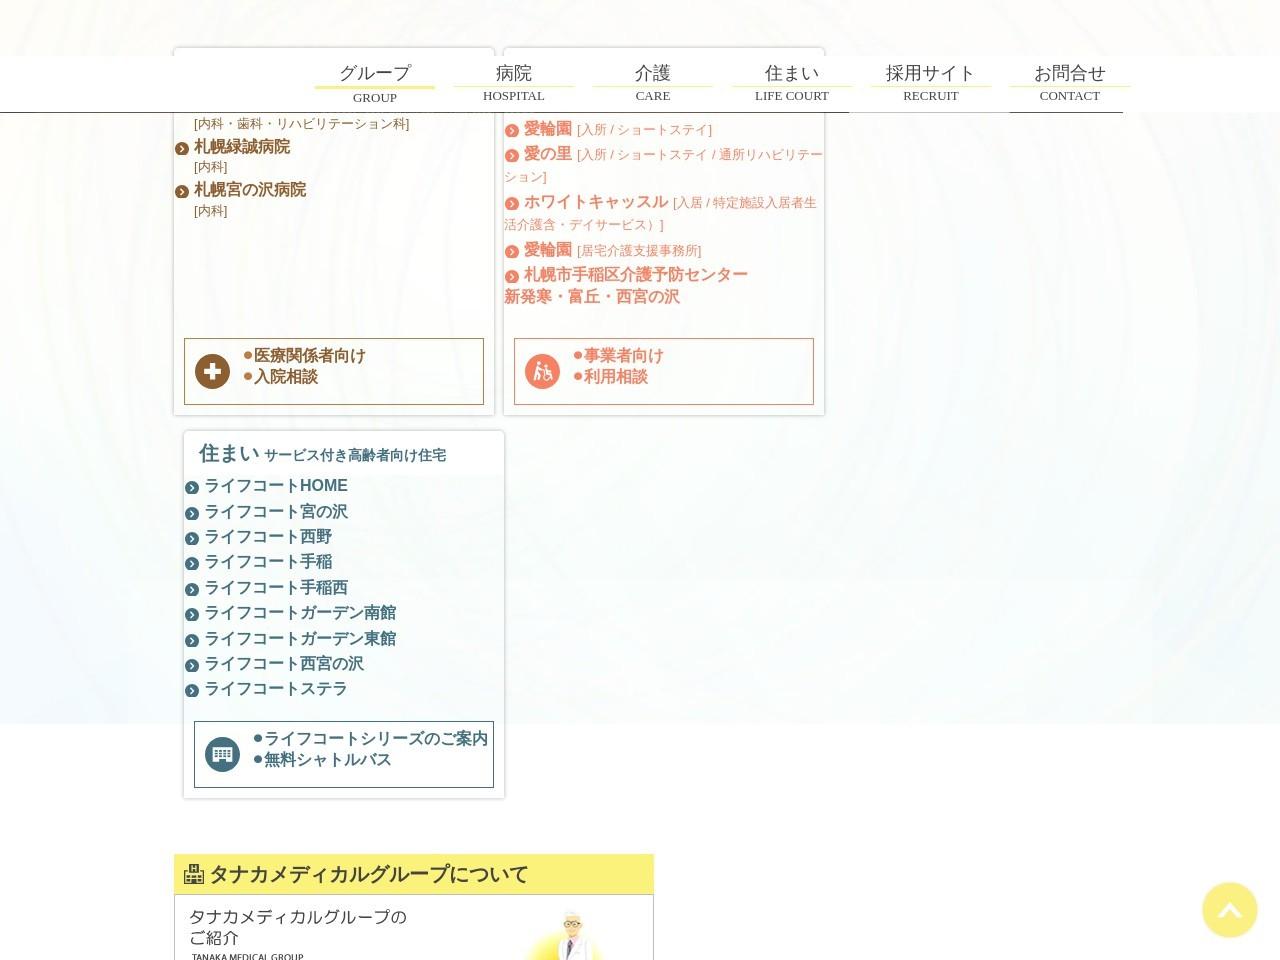 医療法人タナカメディカル  札幌田中病院 (北海道札幌市手稲区)